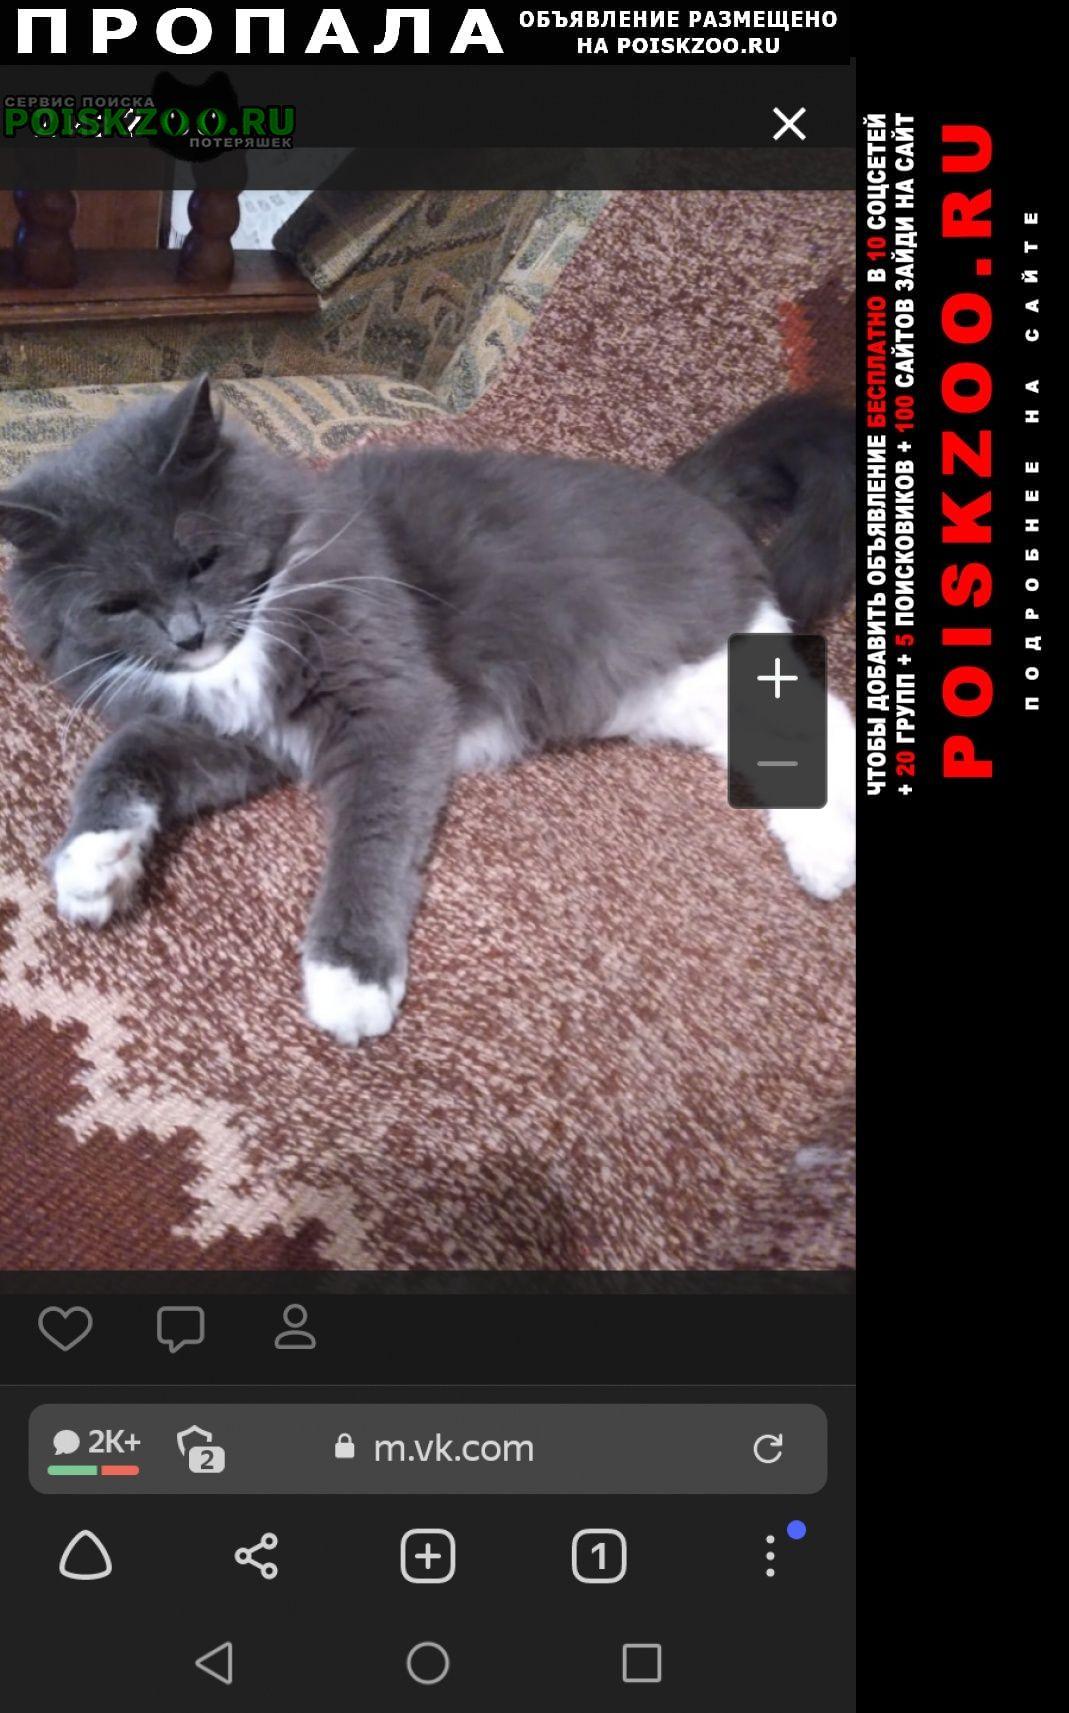 Пропала кошка Пенза